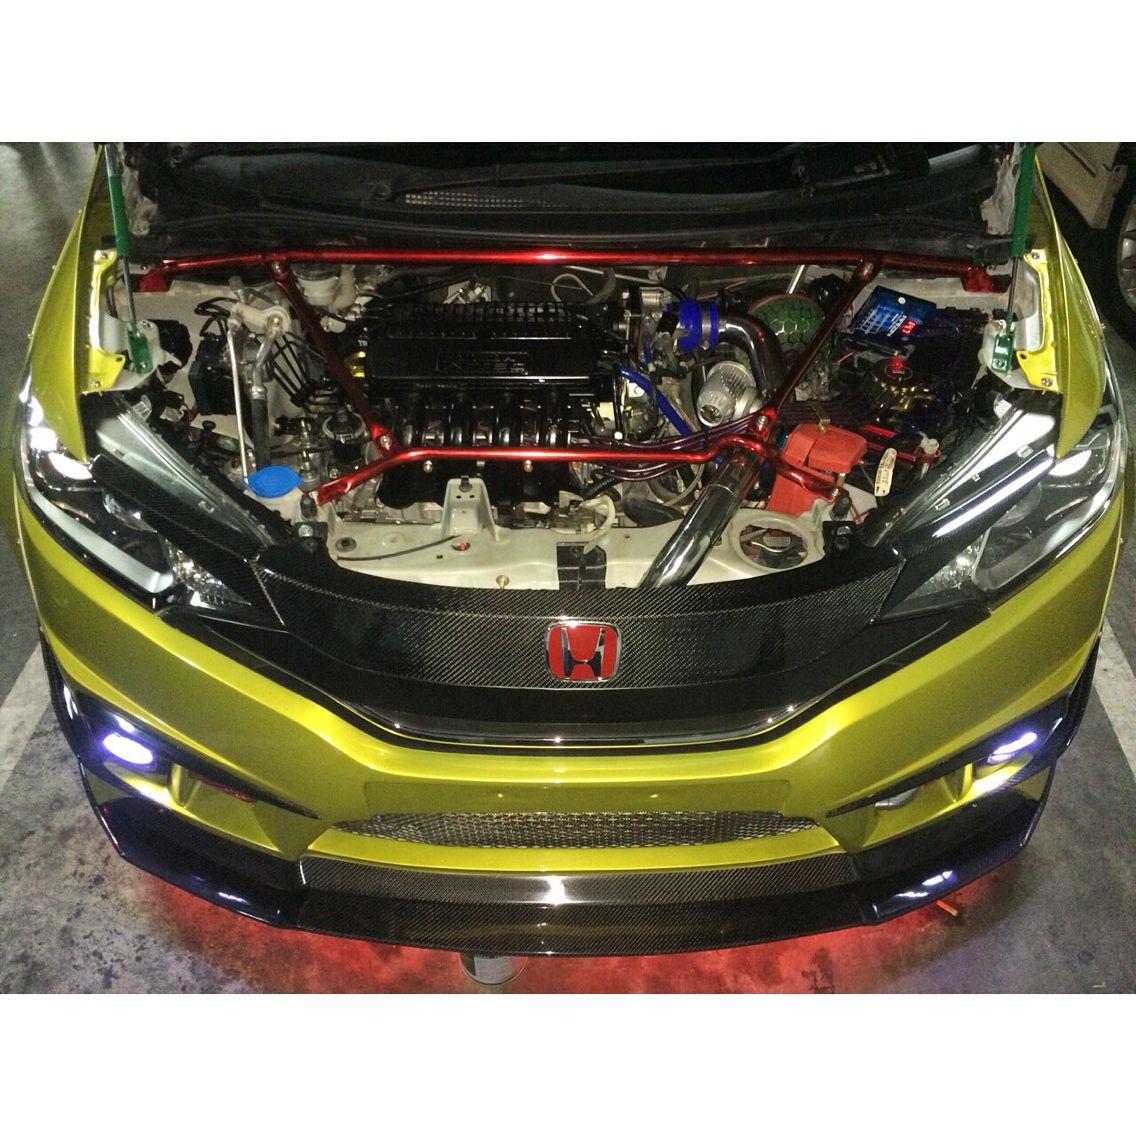 Honda Motorcycle With Fit Engine: Surabaya Town Square (SUTOS)